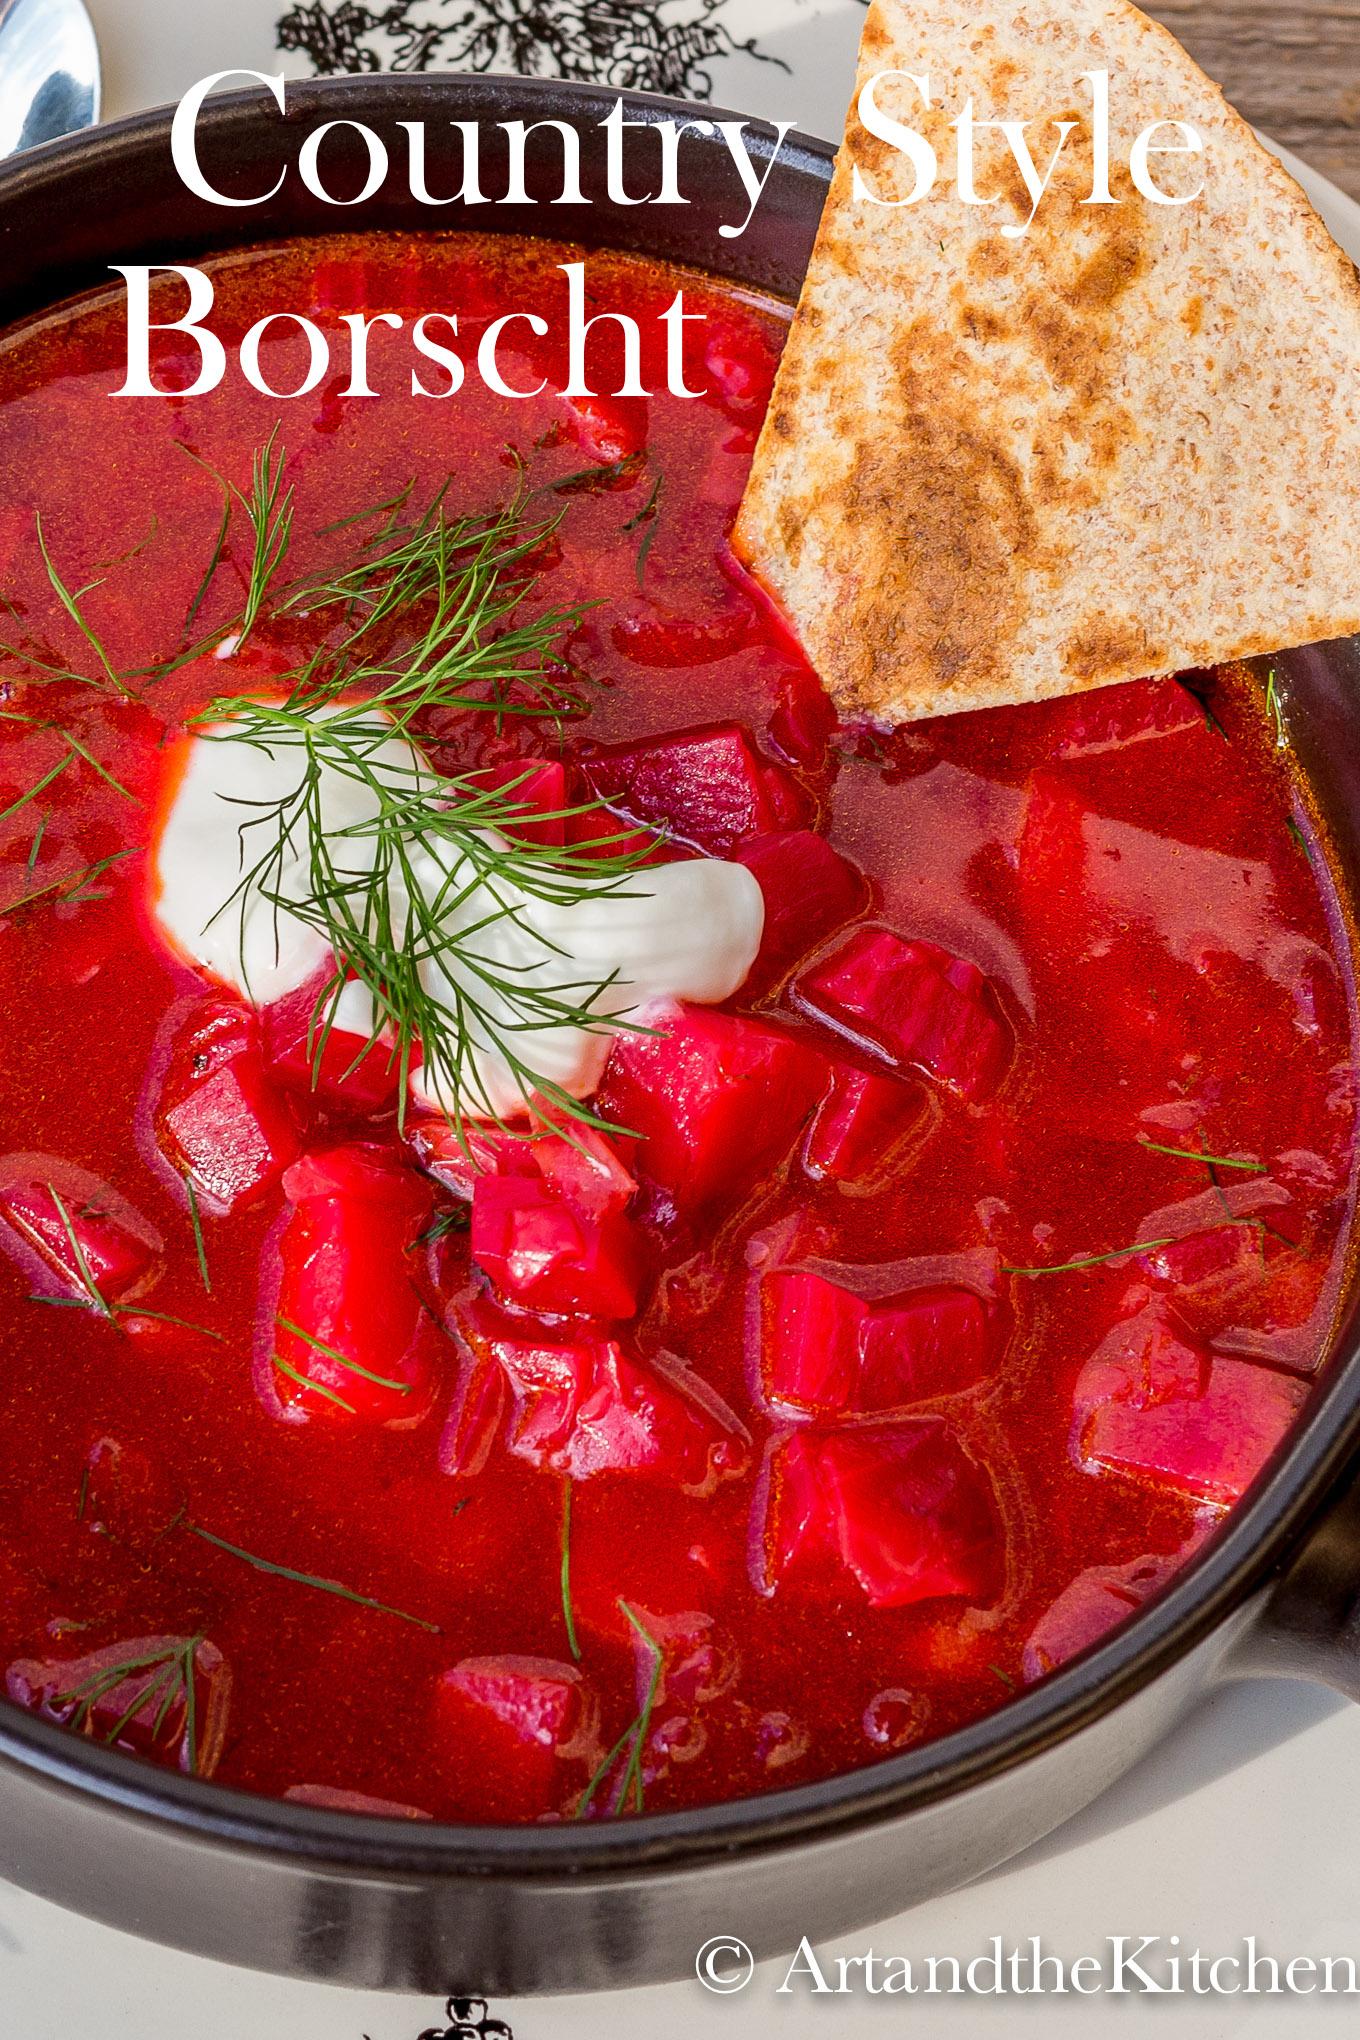 Country Style Borscht